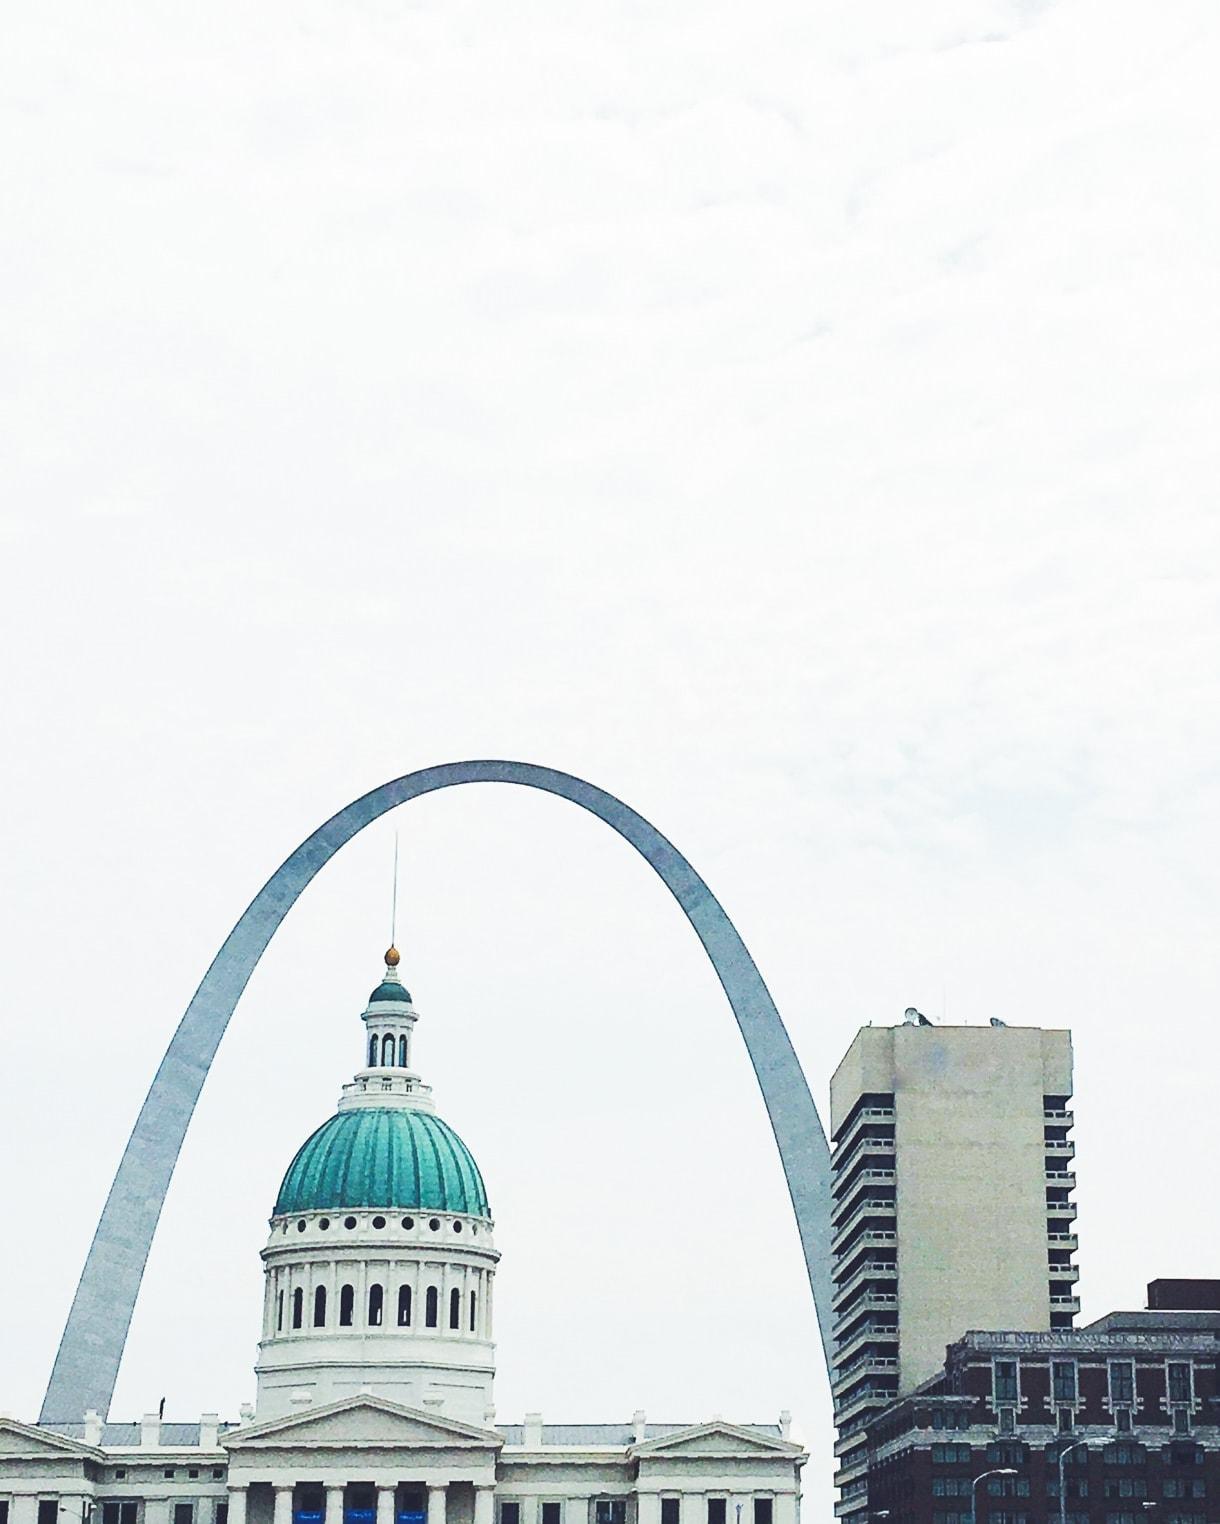 saint louis arch skyline